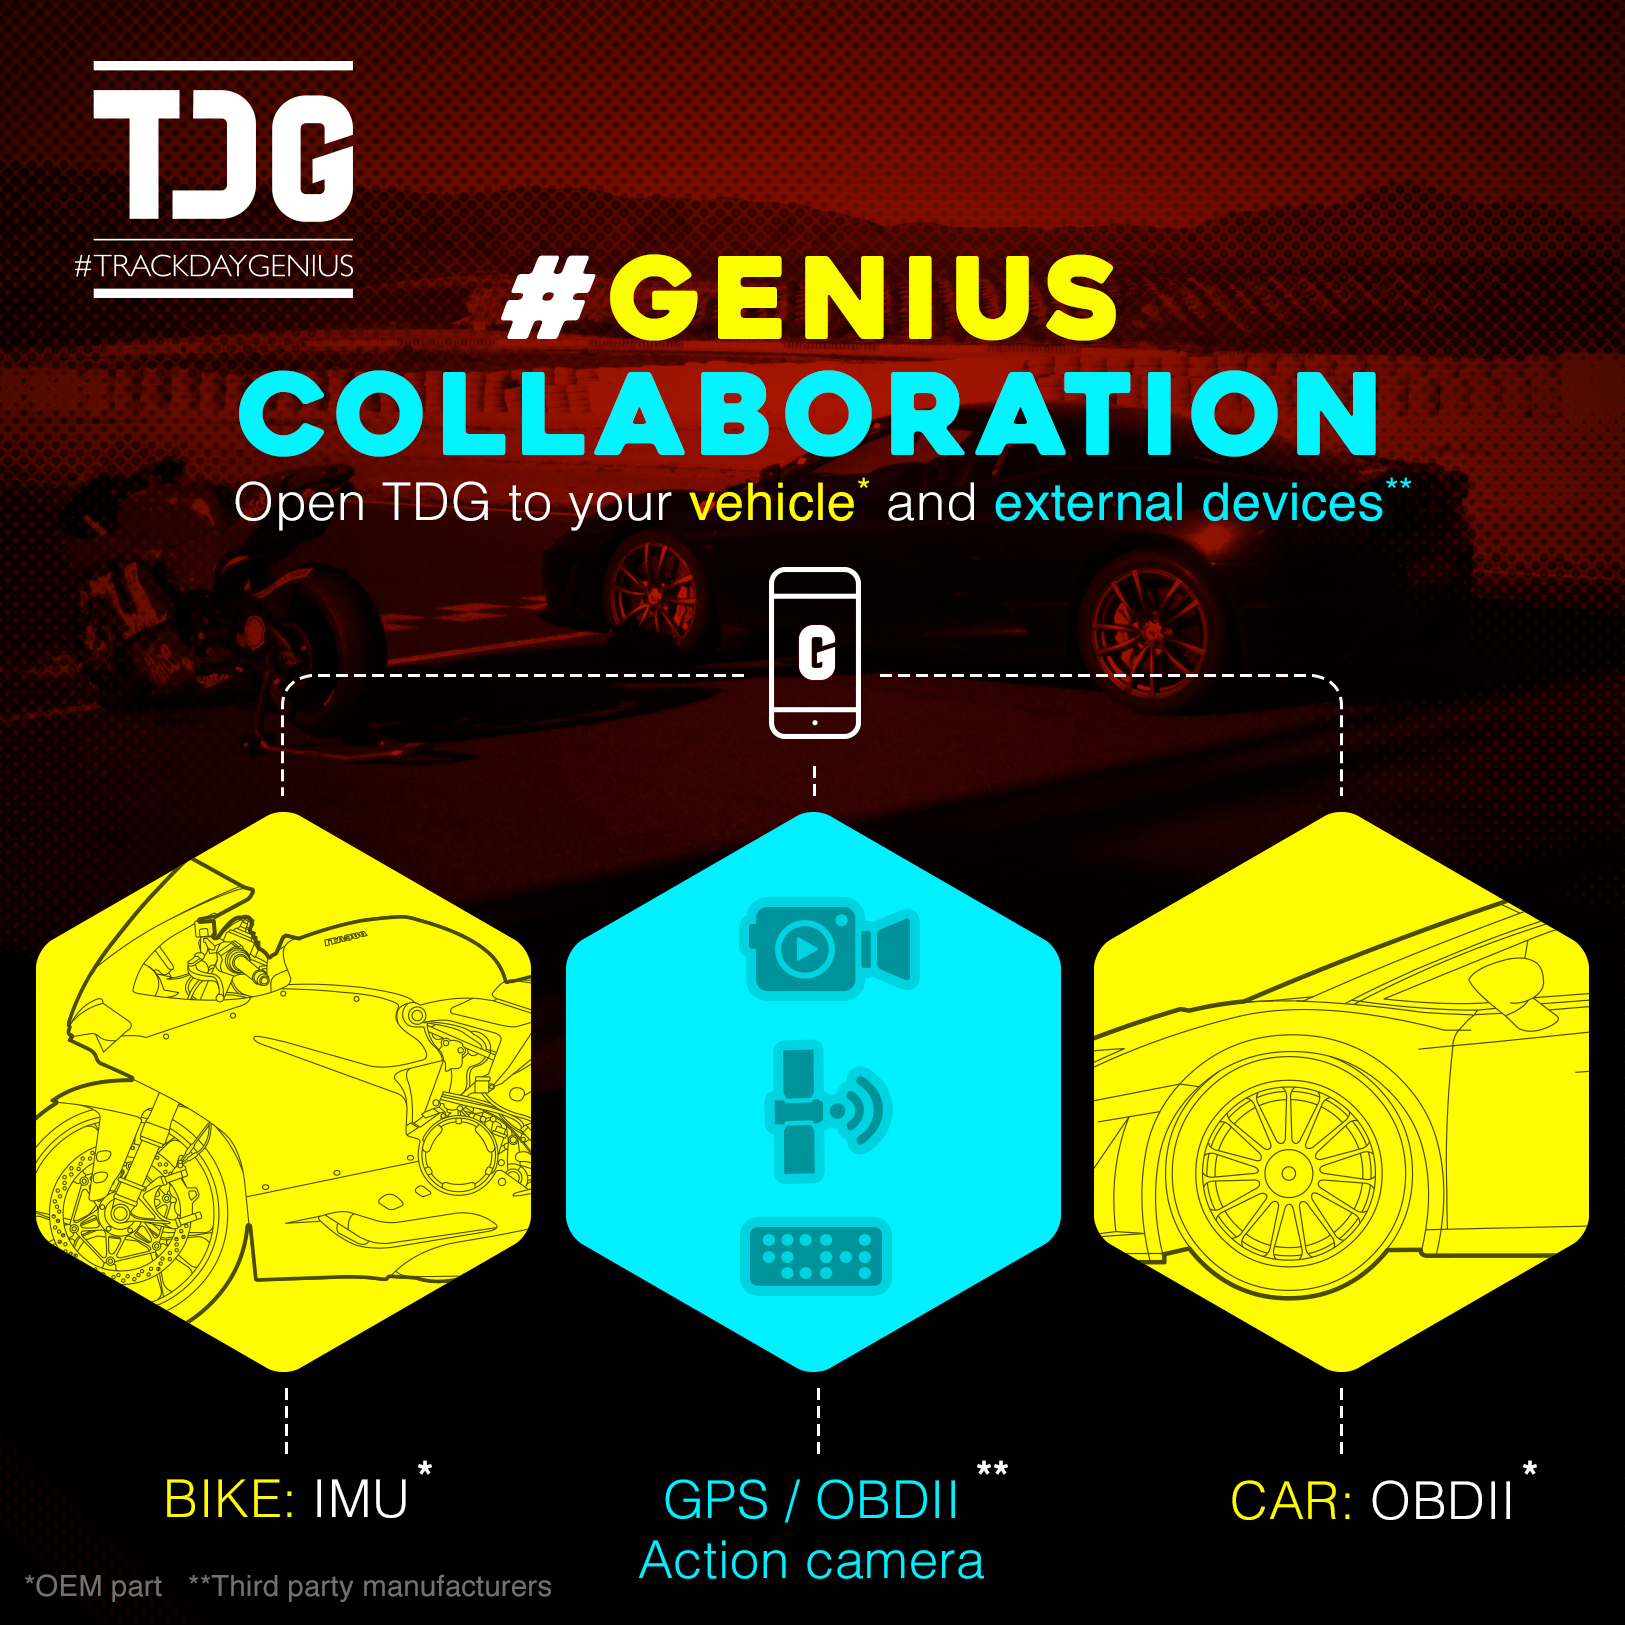 tdg-hashTag-geniusCollaboration-devices-v4a-sq